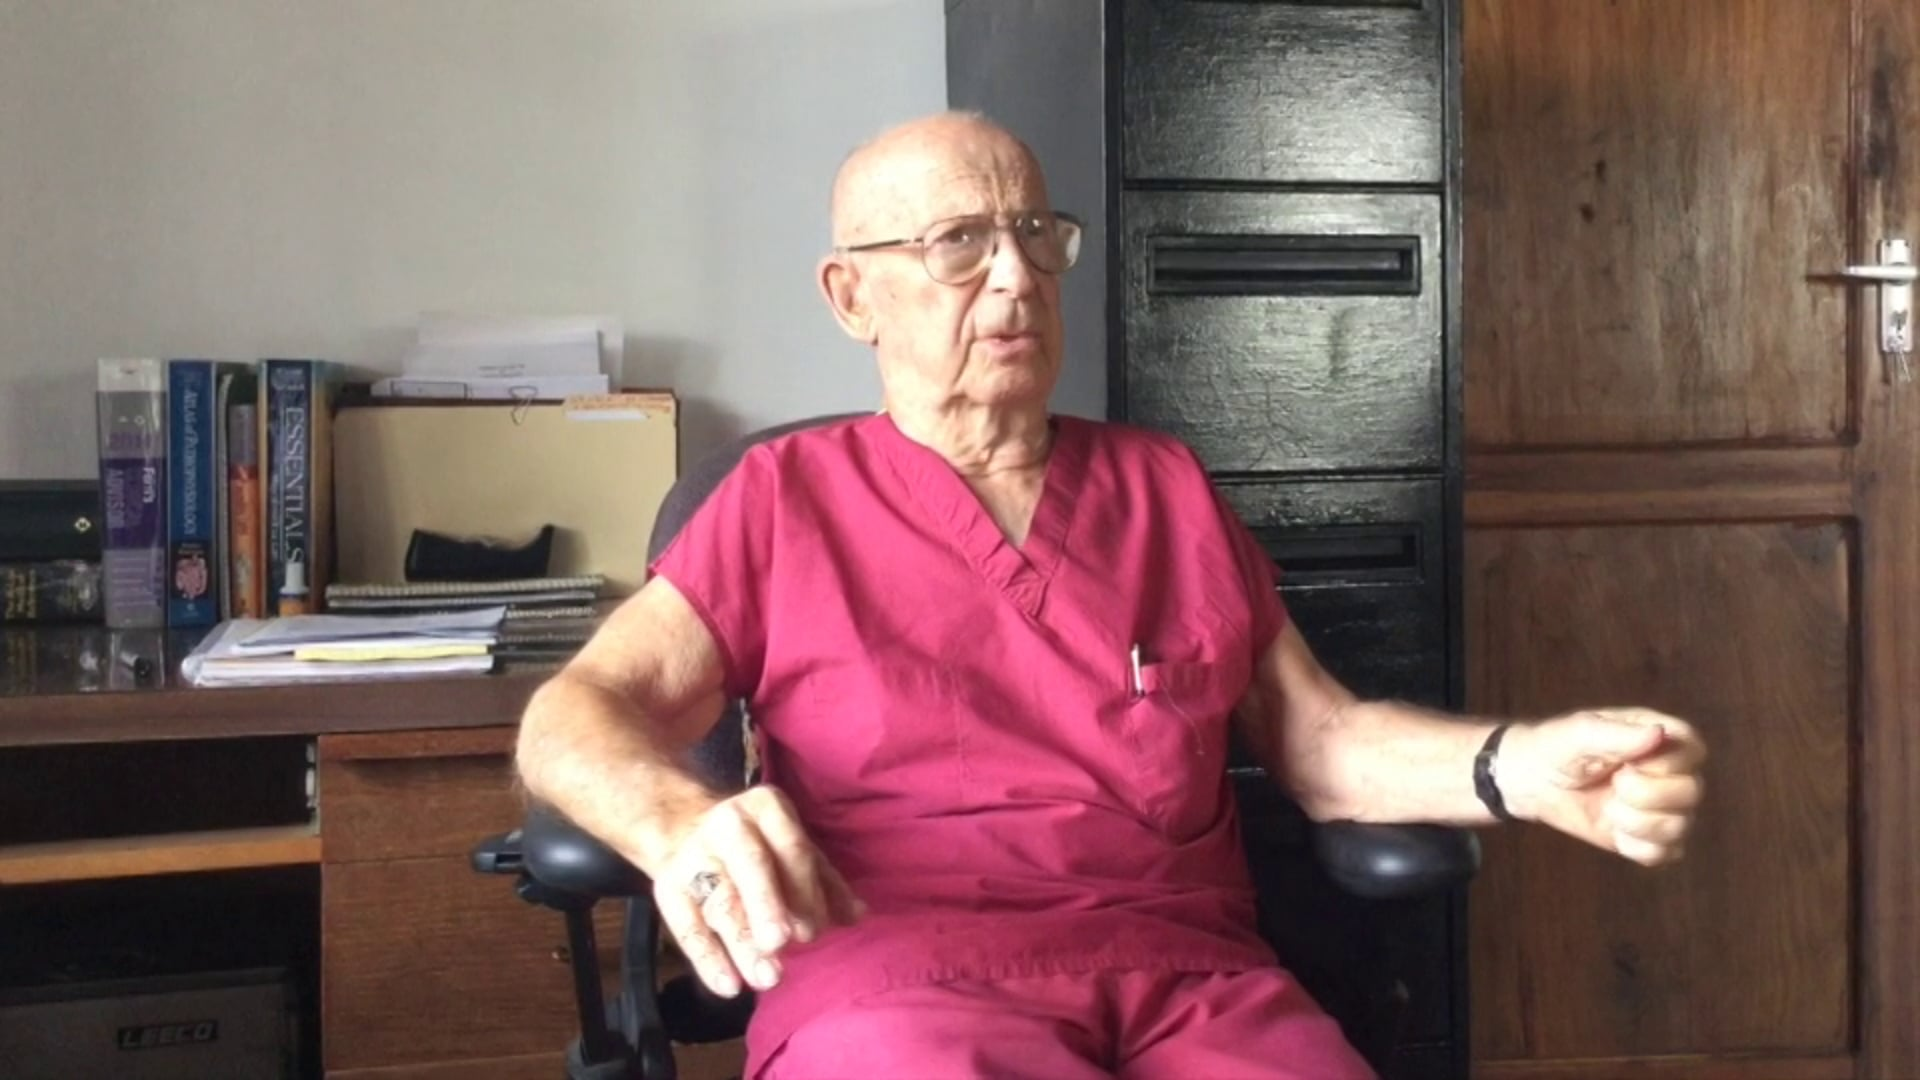 Interview with Dennis Lofstrom, MD